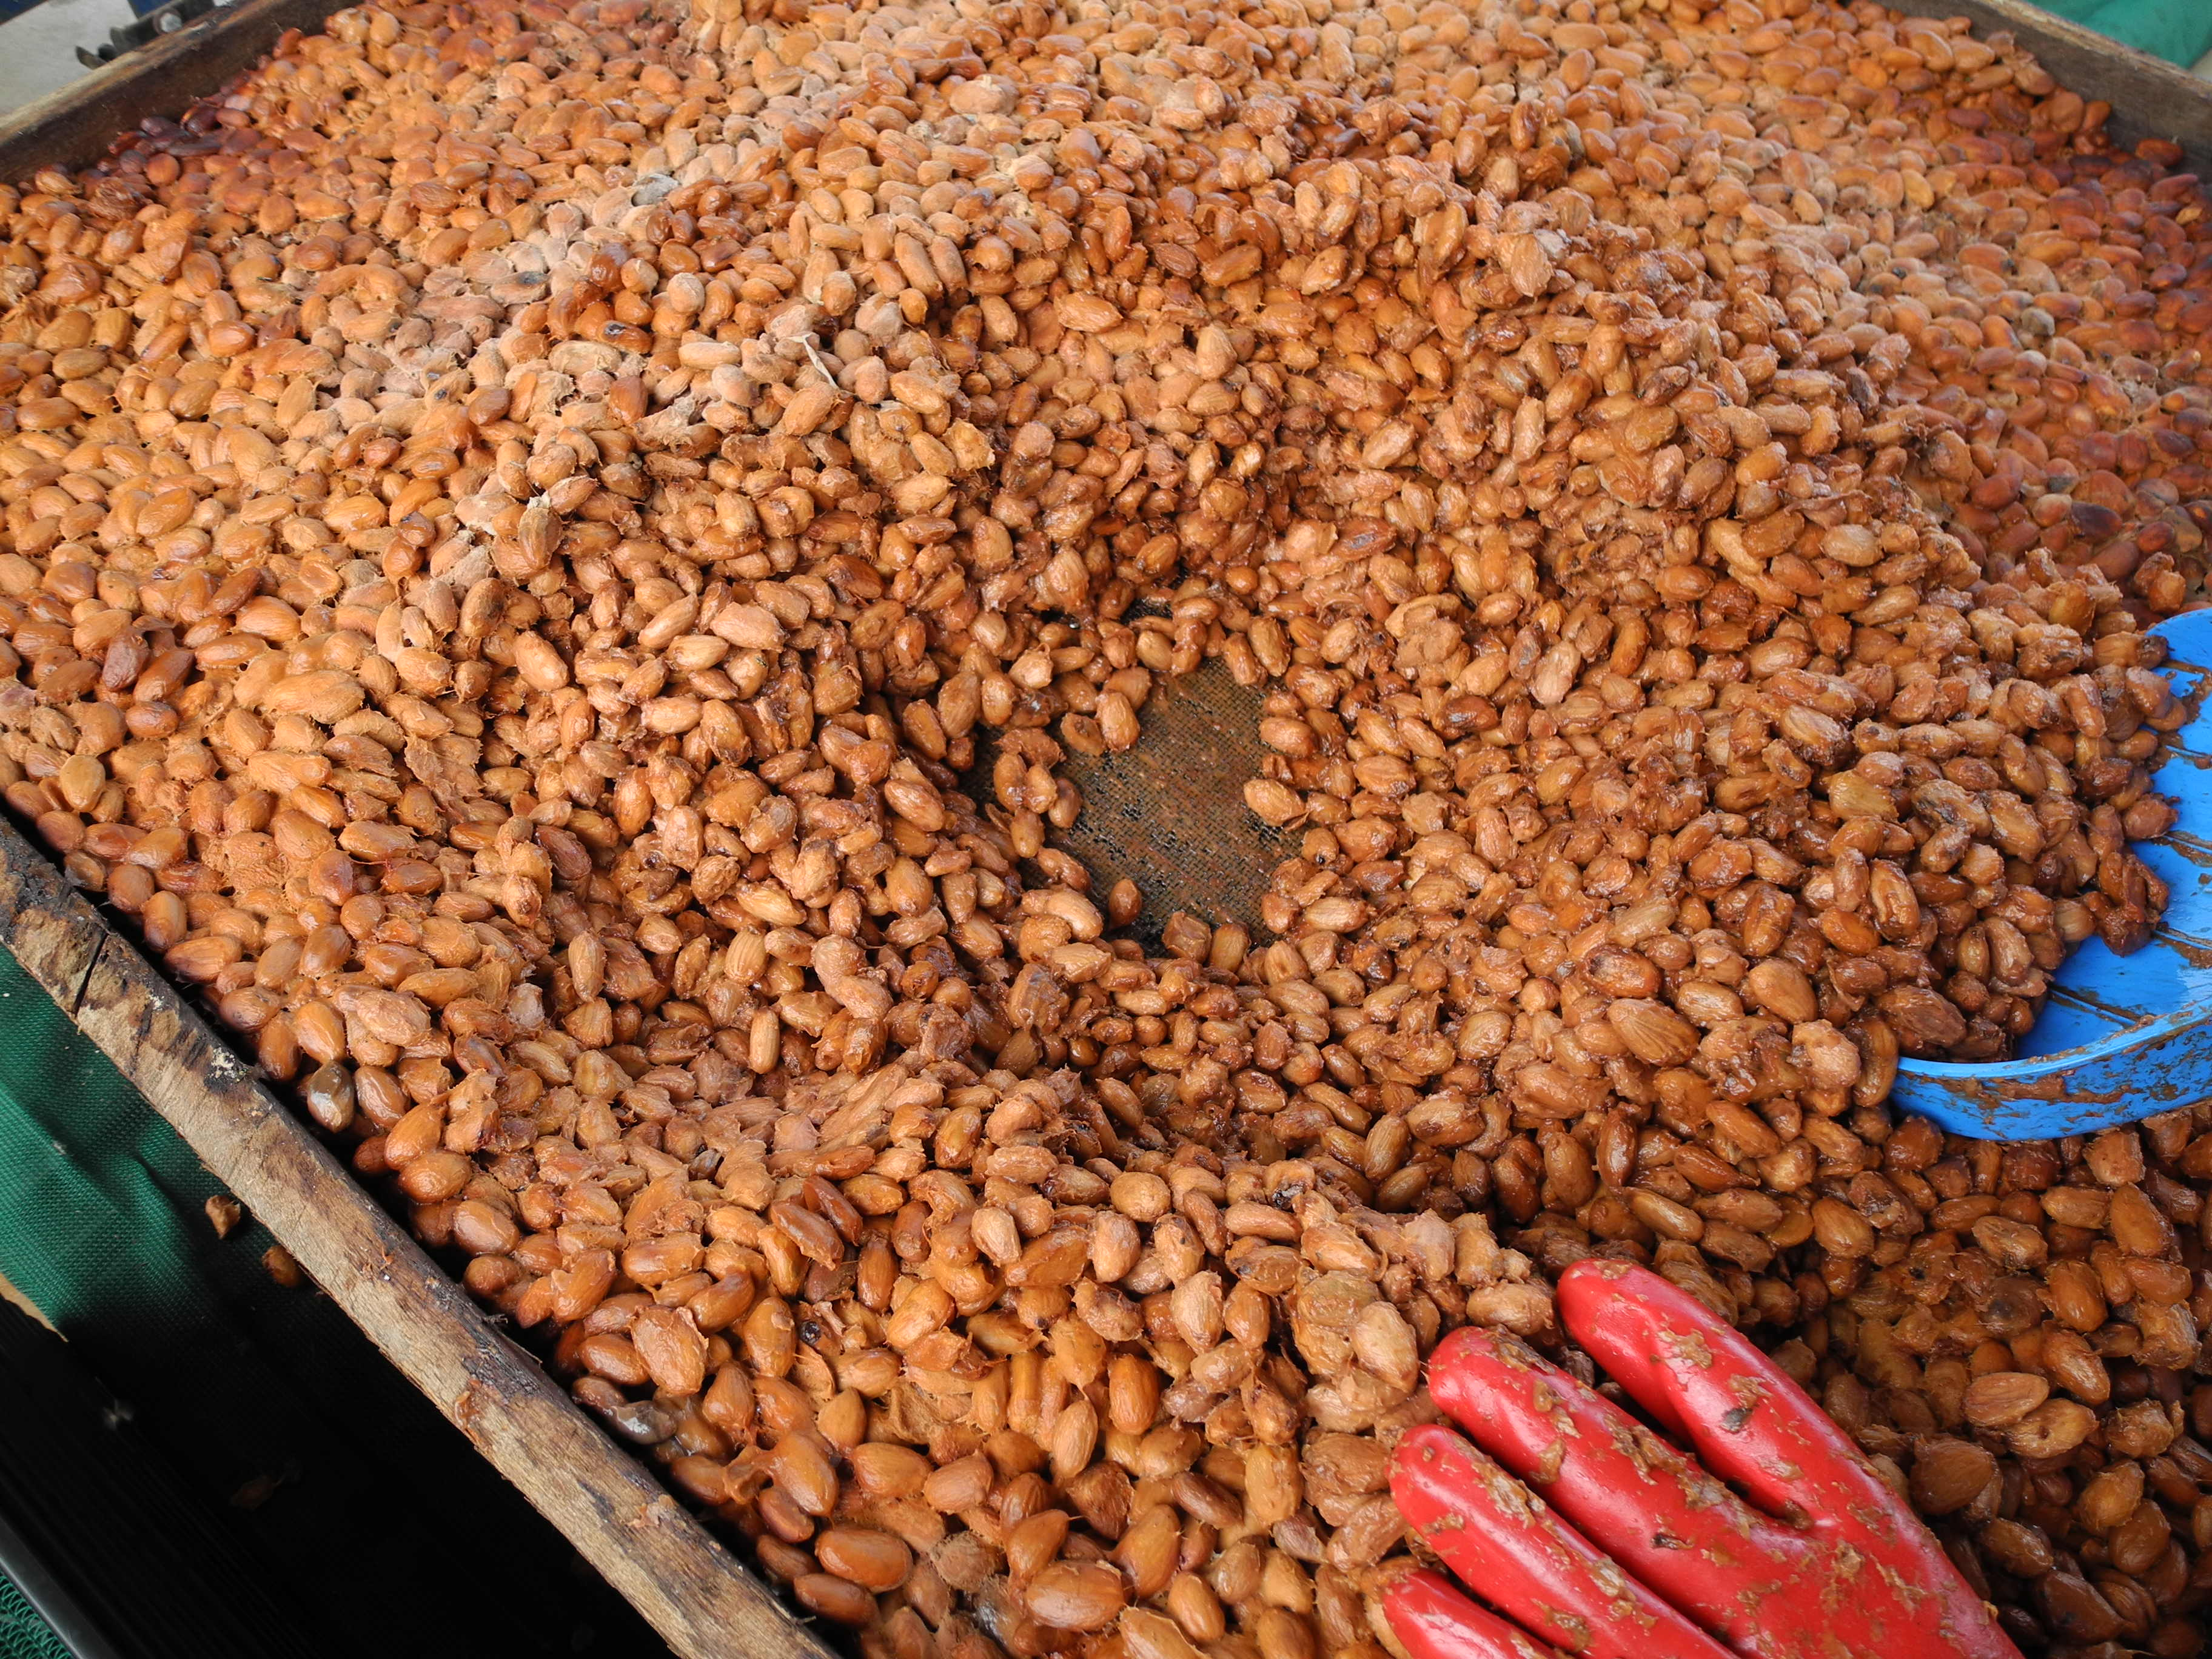 fermenting cocoa beans